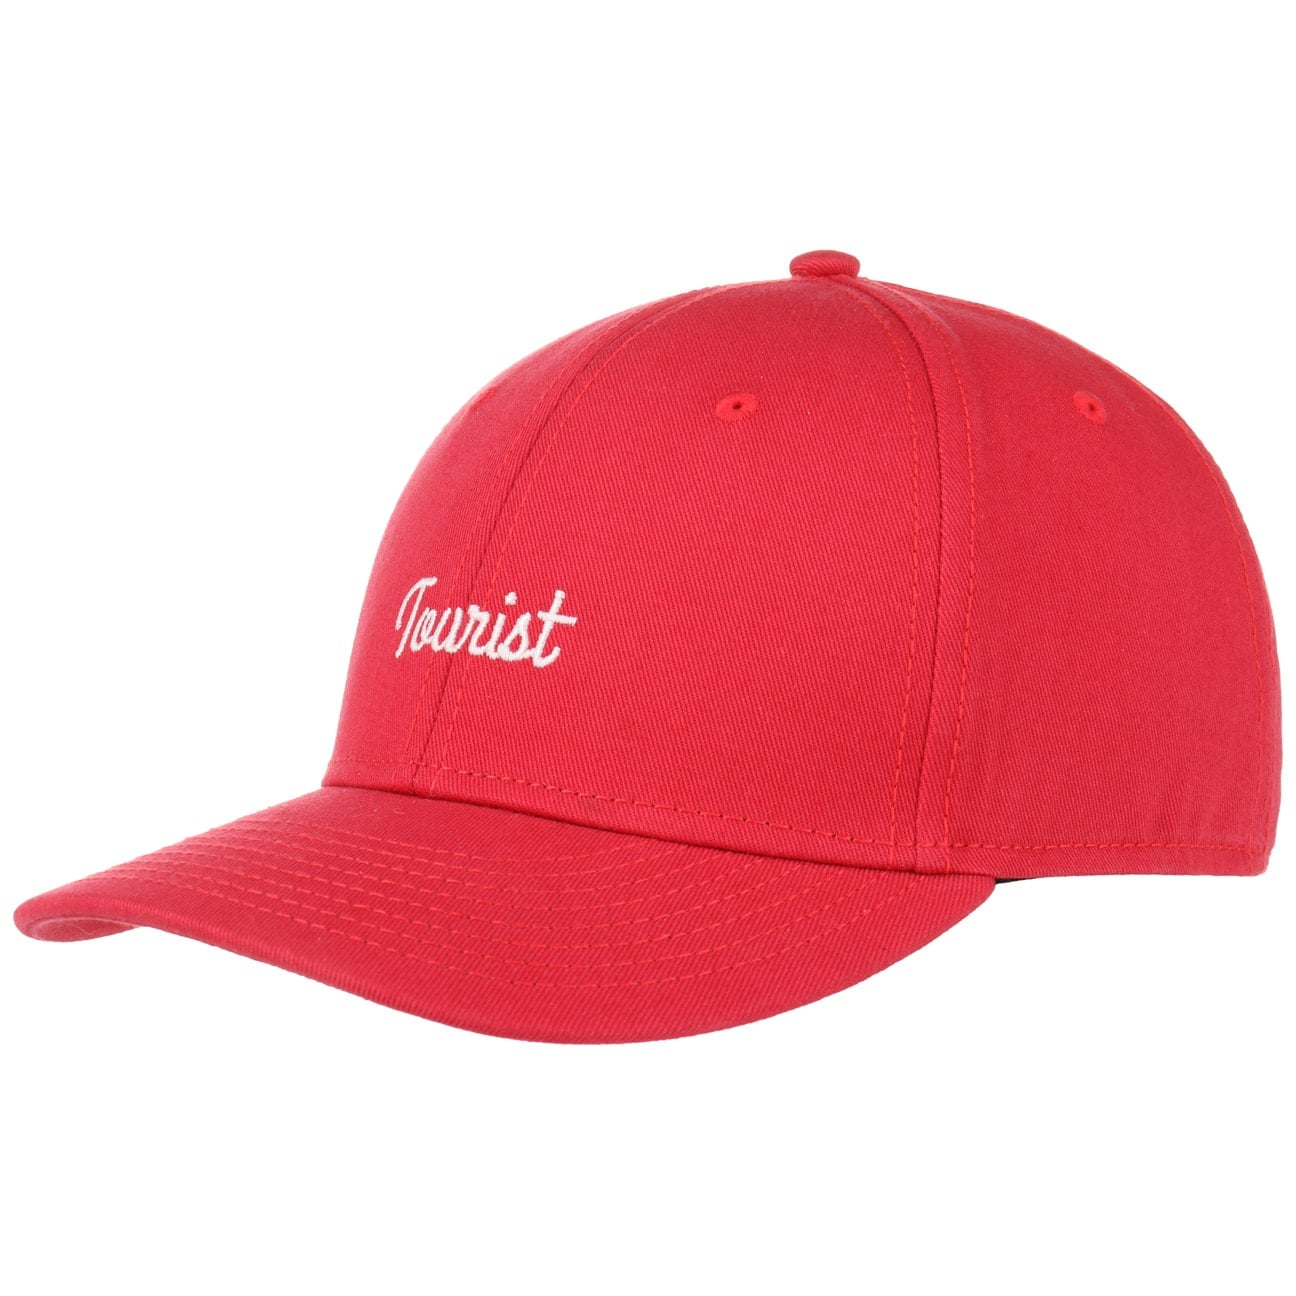 Casquette Tourist Strapback by Wemoto  baseball cap